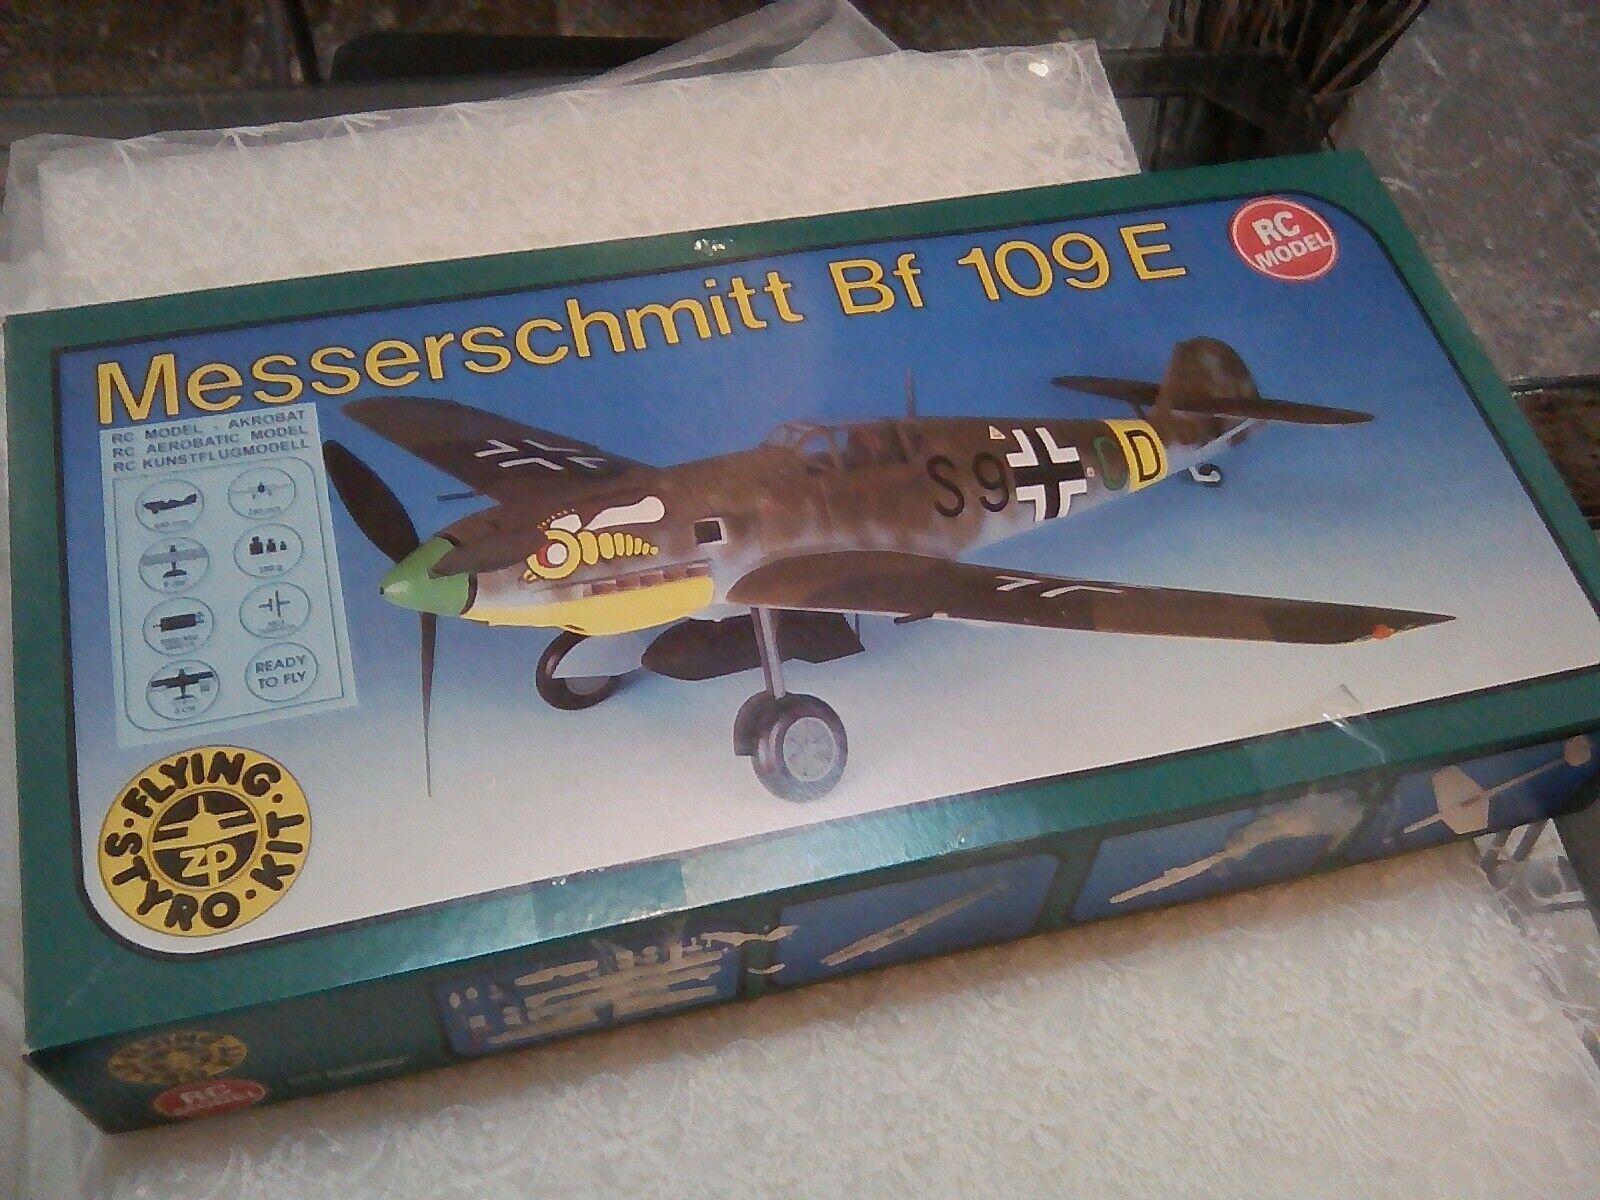 Messerschmitt Messerschmitt Messerschmitt Bf 109 e hormigón armado modelo areo retro. 615